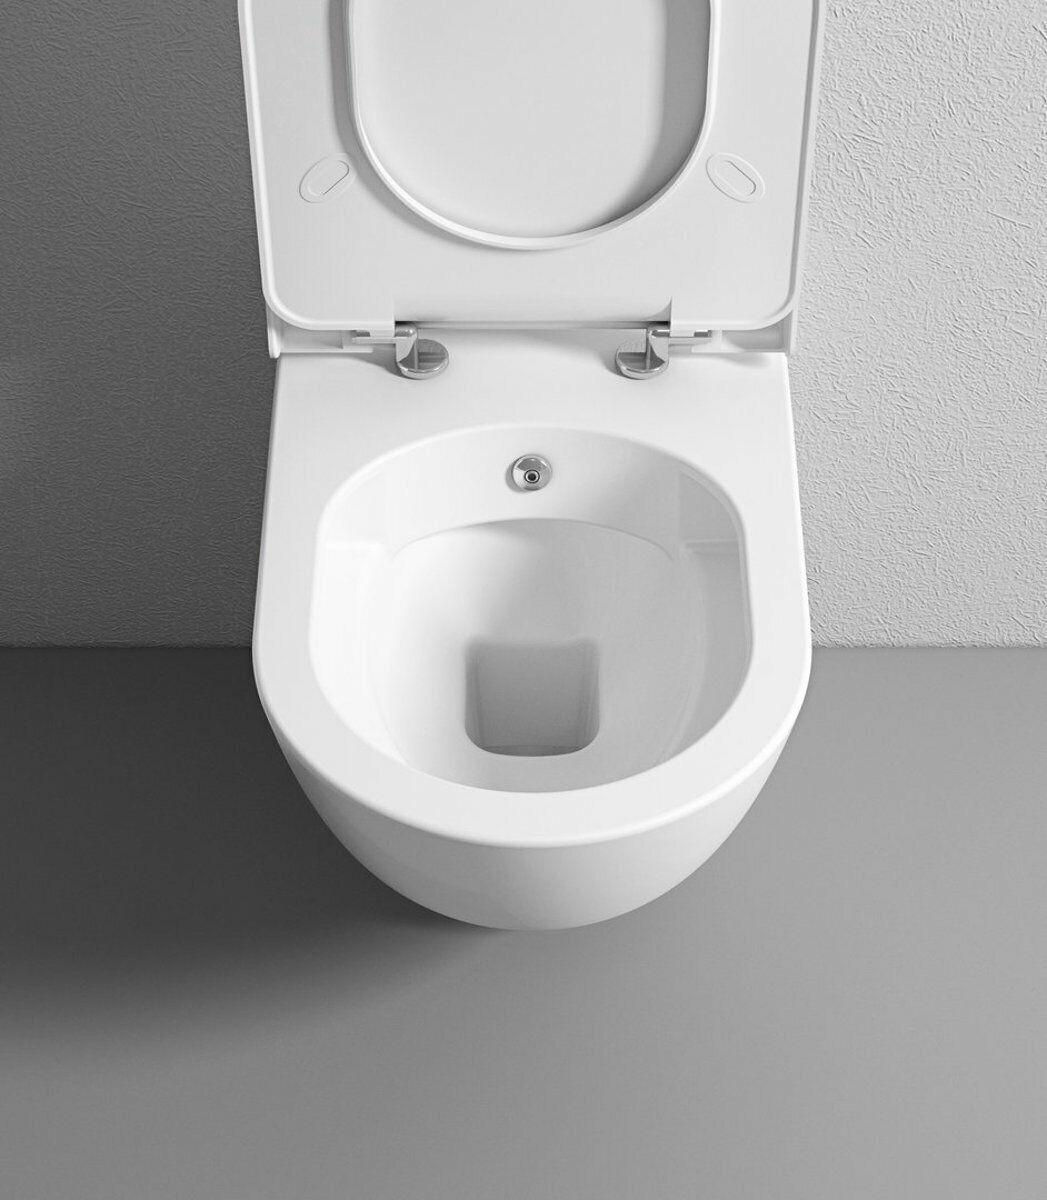 Hänge Dusch WC Taharet Bidet Funktion Toilette Aloni inkl. Softclose Deckel